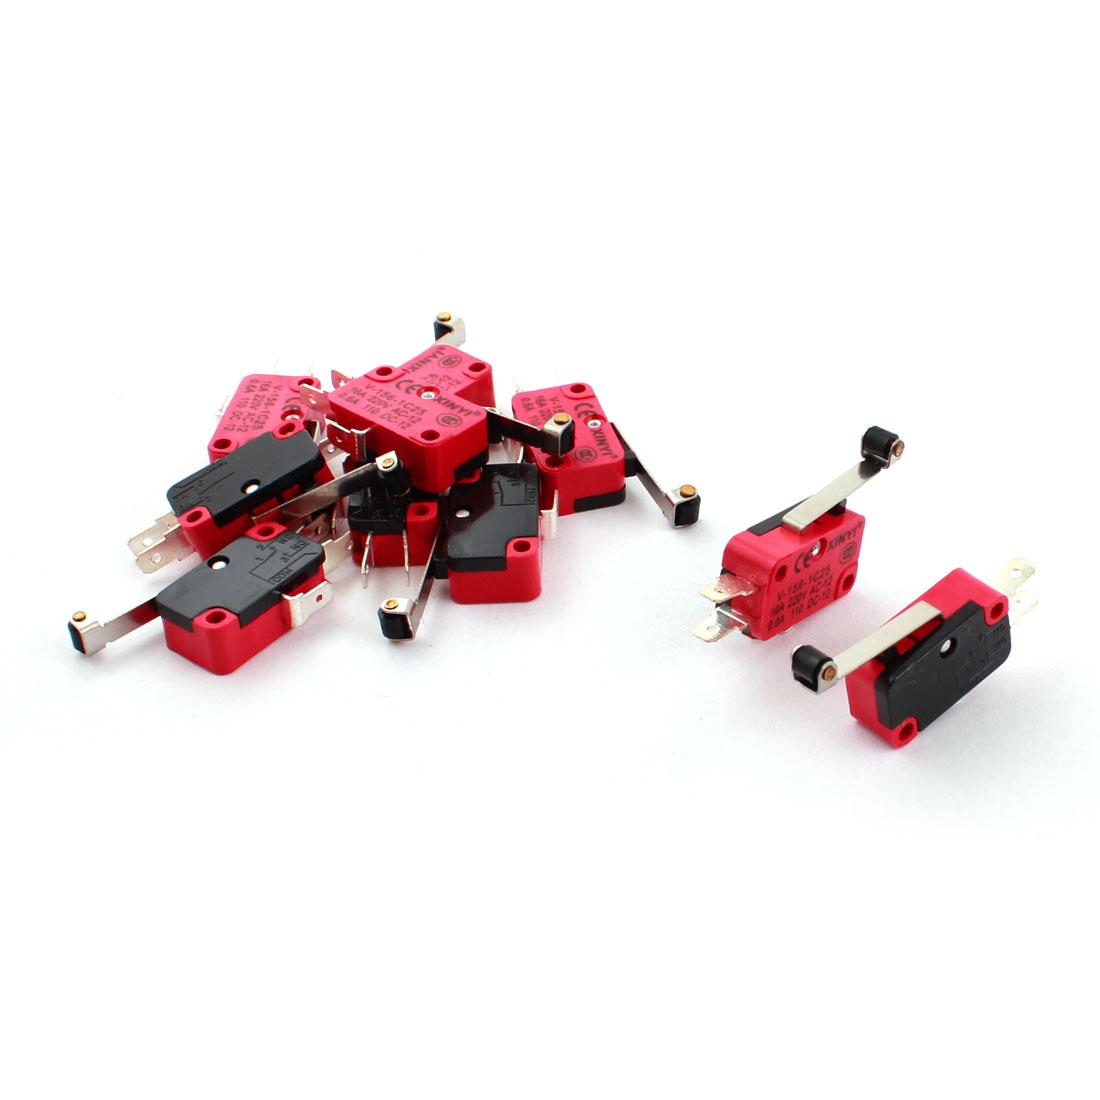 10 Pcs V-156-1C25 Micro Limit Switch Long Hinge Roller Lever Arm SPDT Snap Action LOT